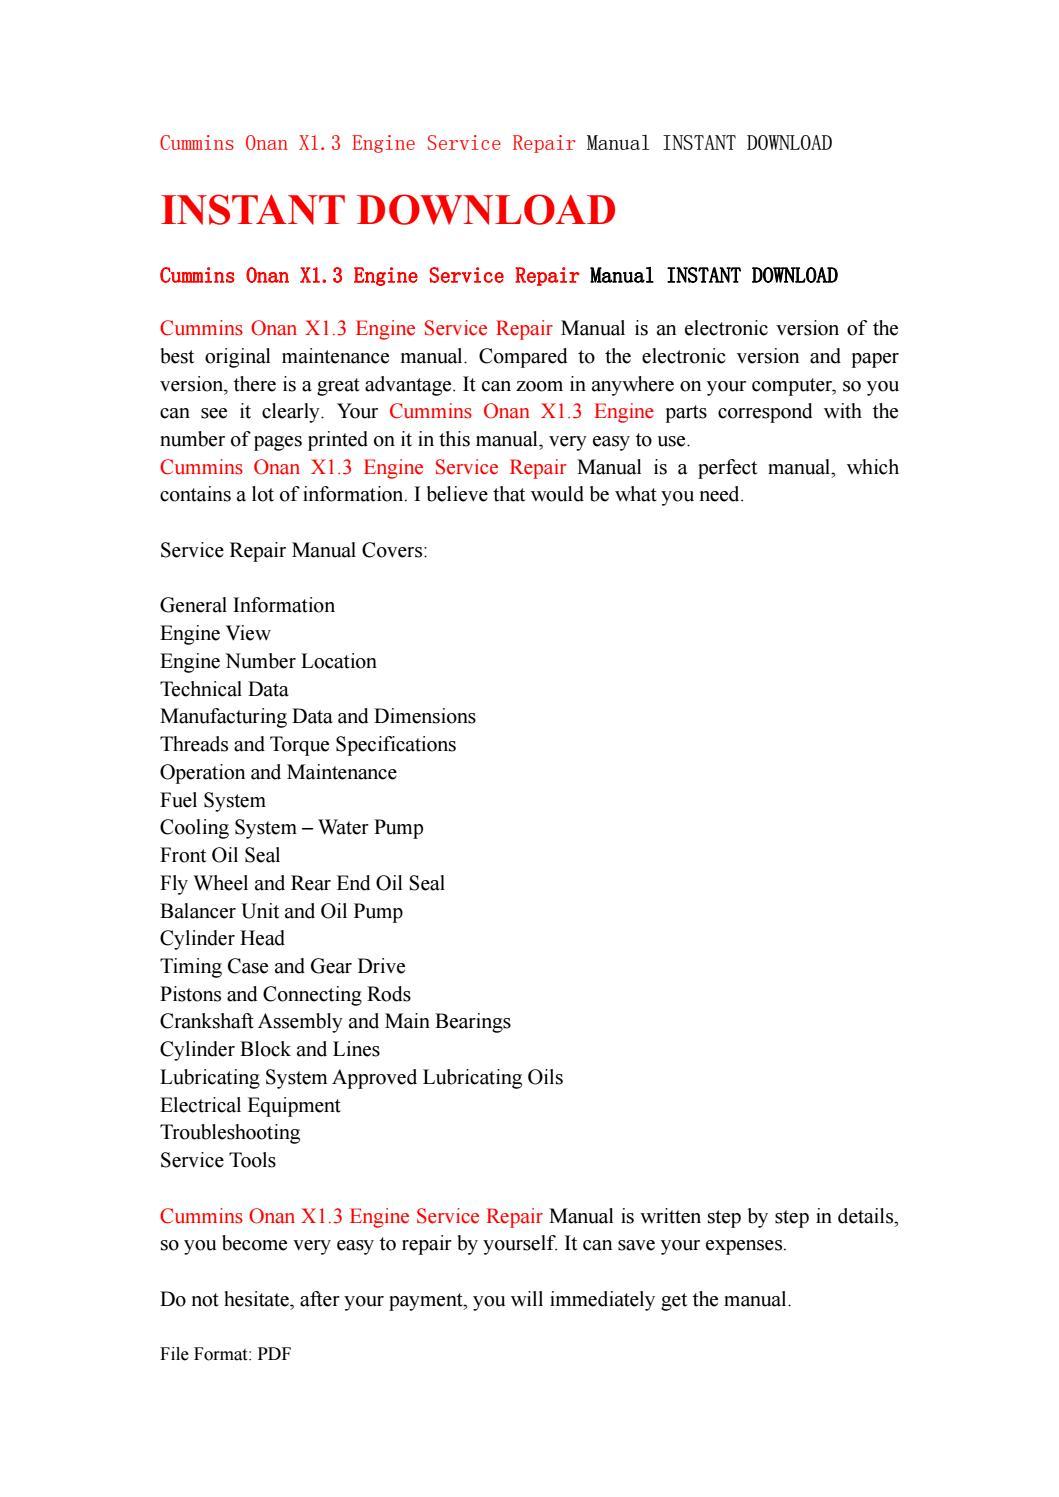 Cummins onan x1 3 engine service repair manual instant download by  kjjsemfmse - issuu